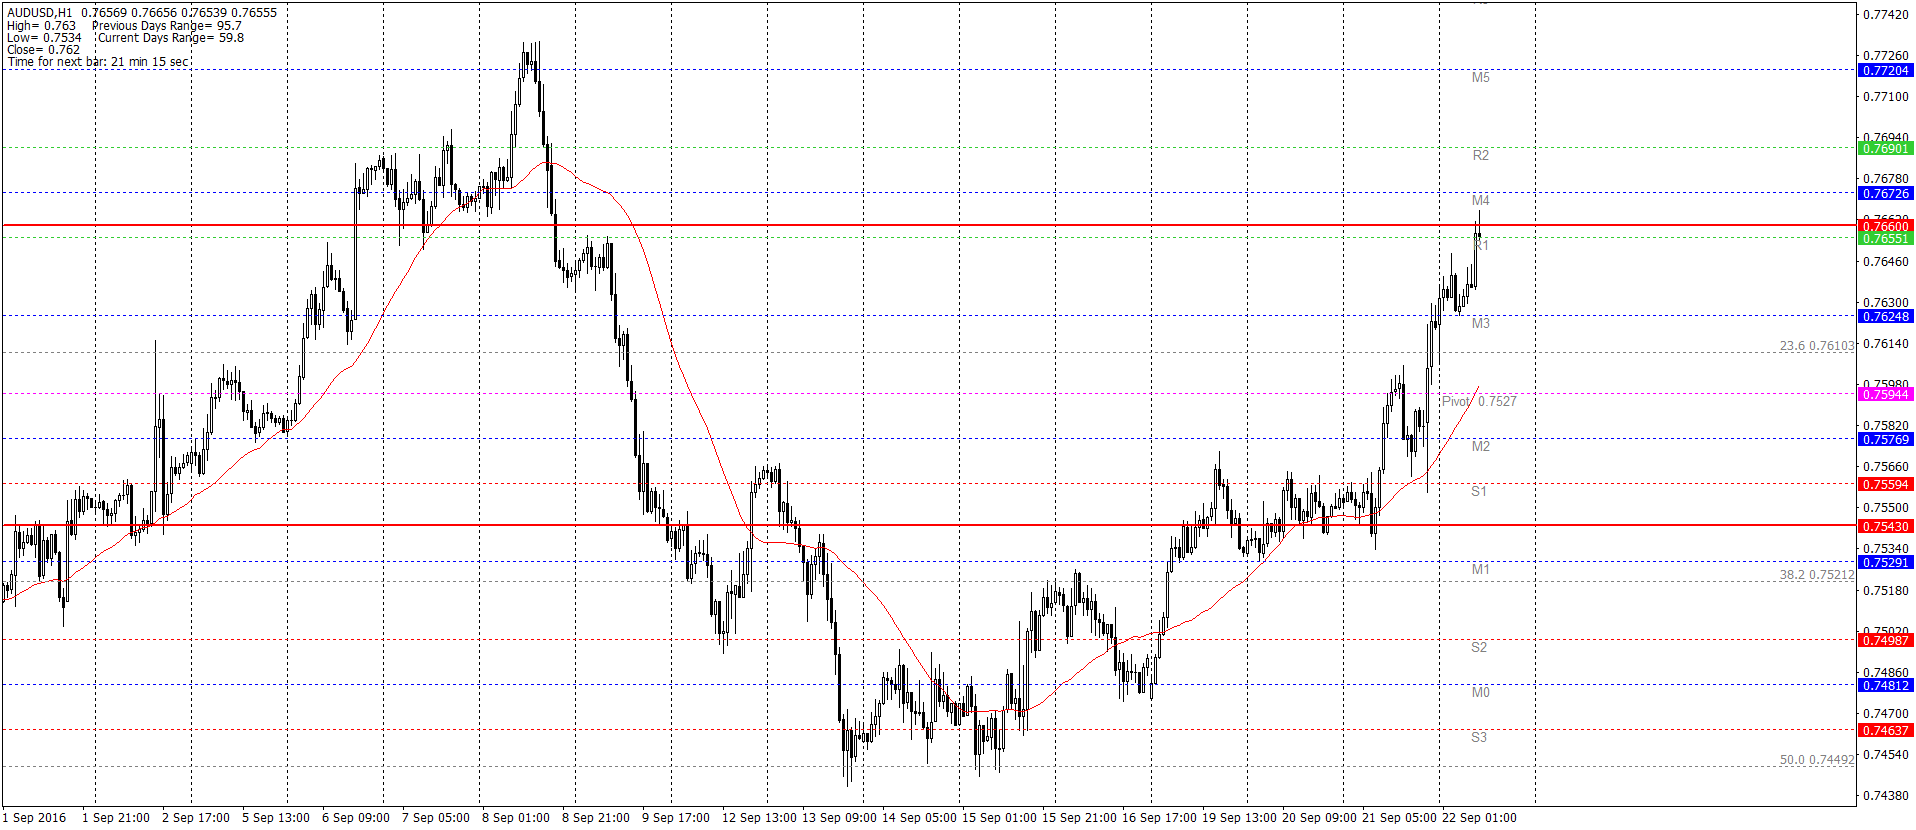 AUD/USD H1